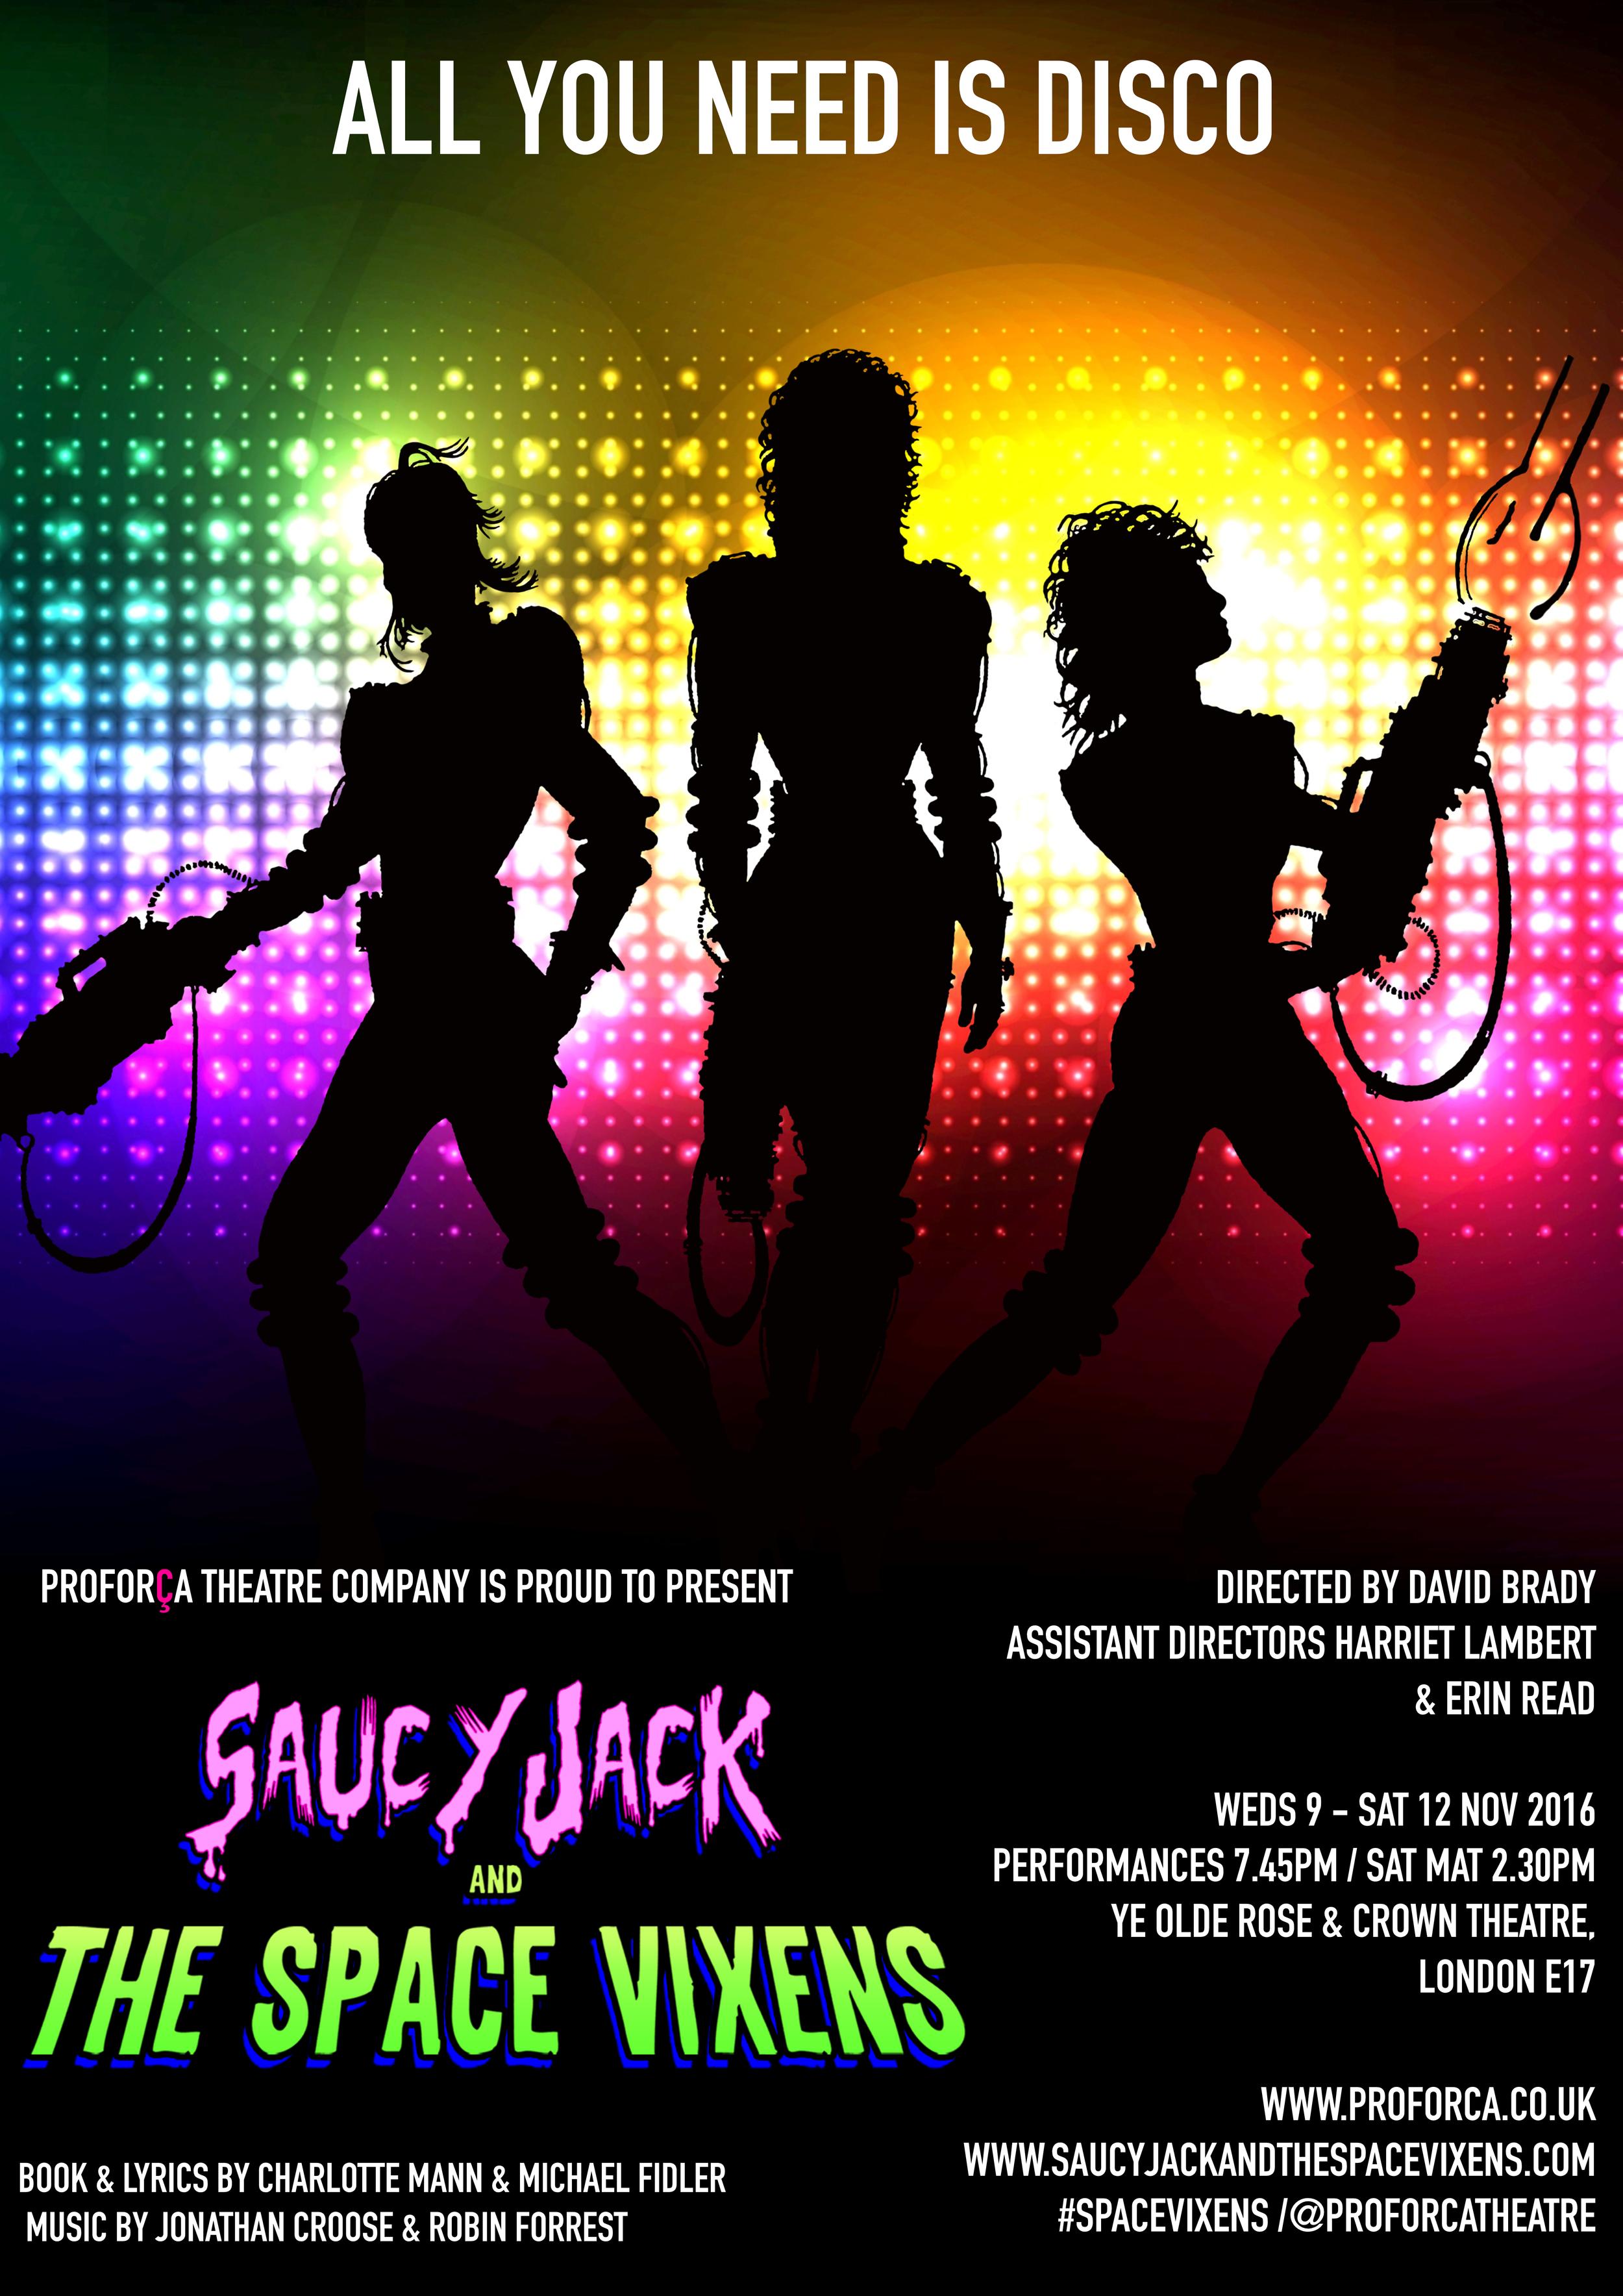 Saucy Jack & The Space Vixens (2016)